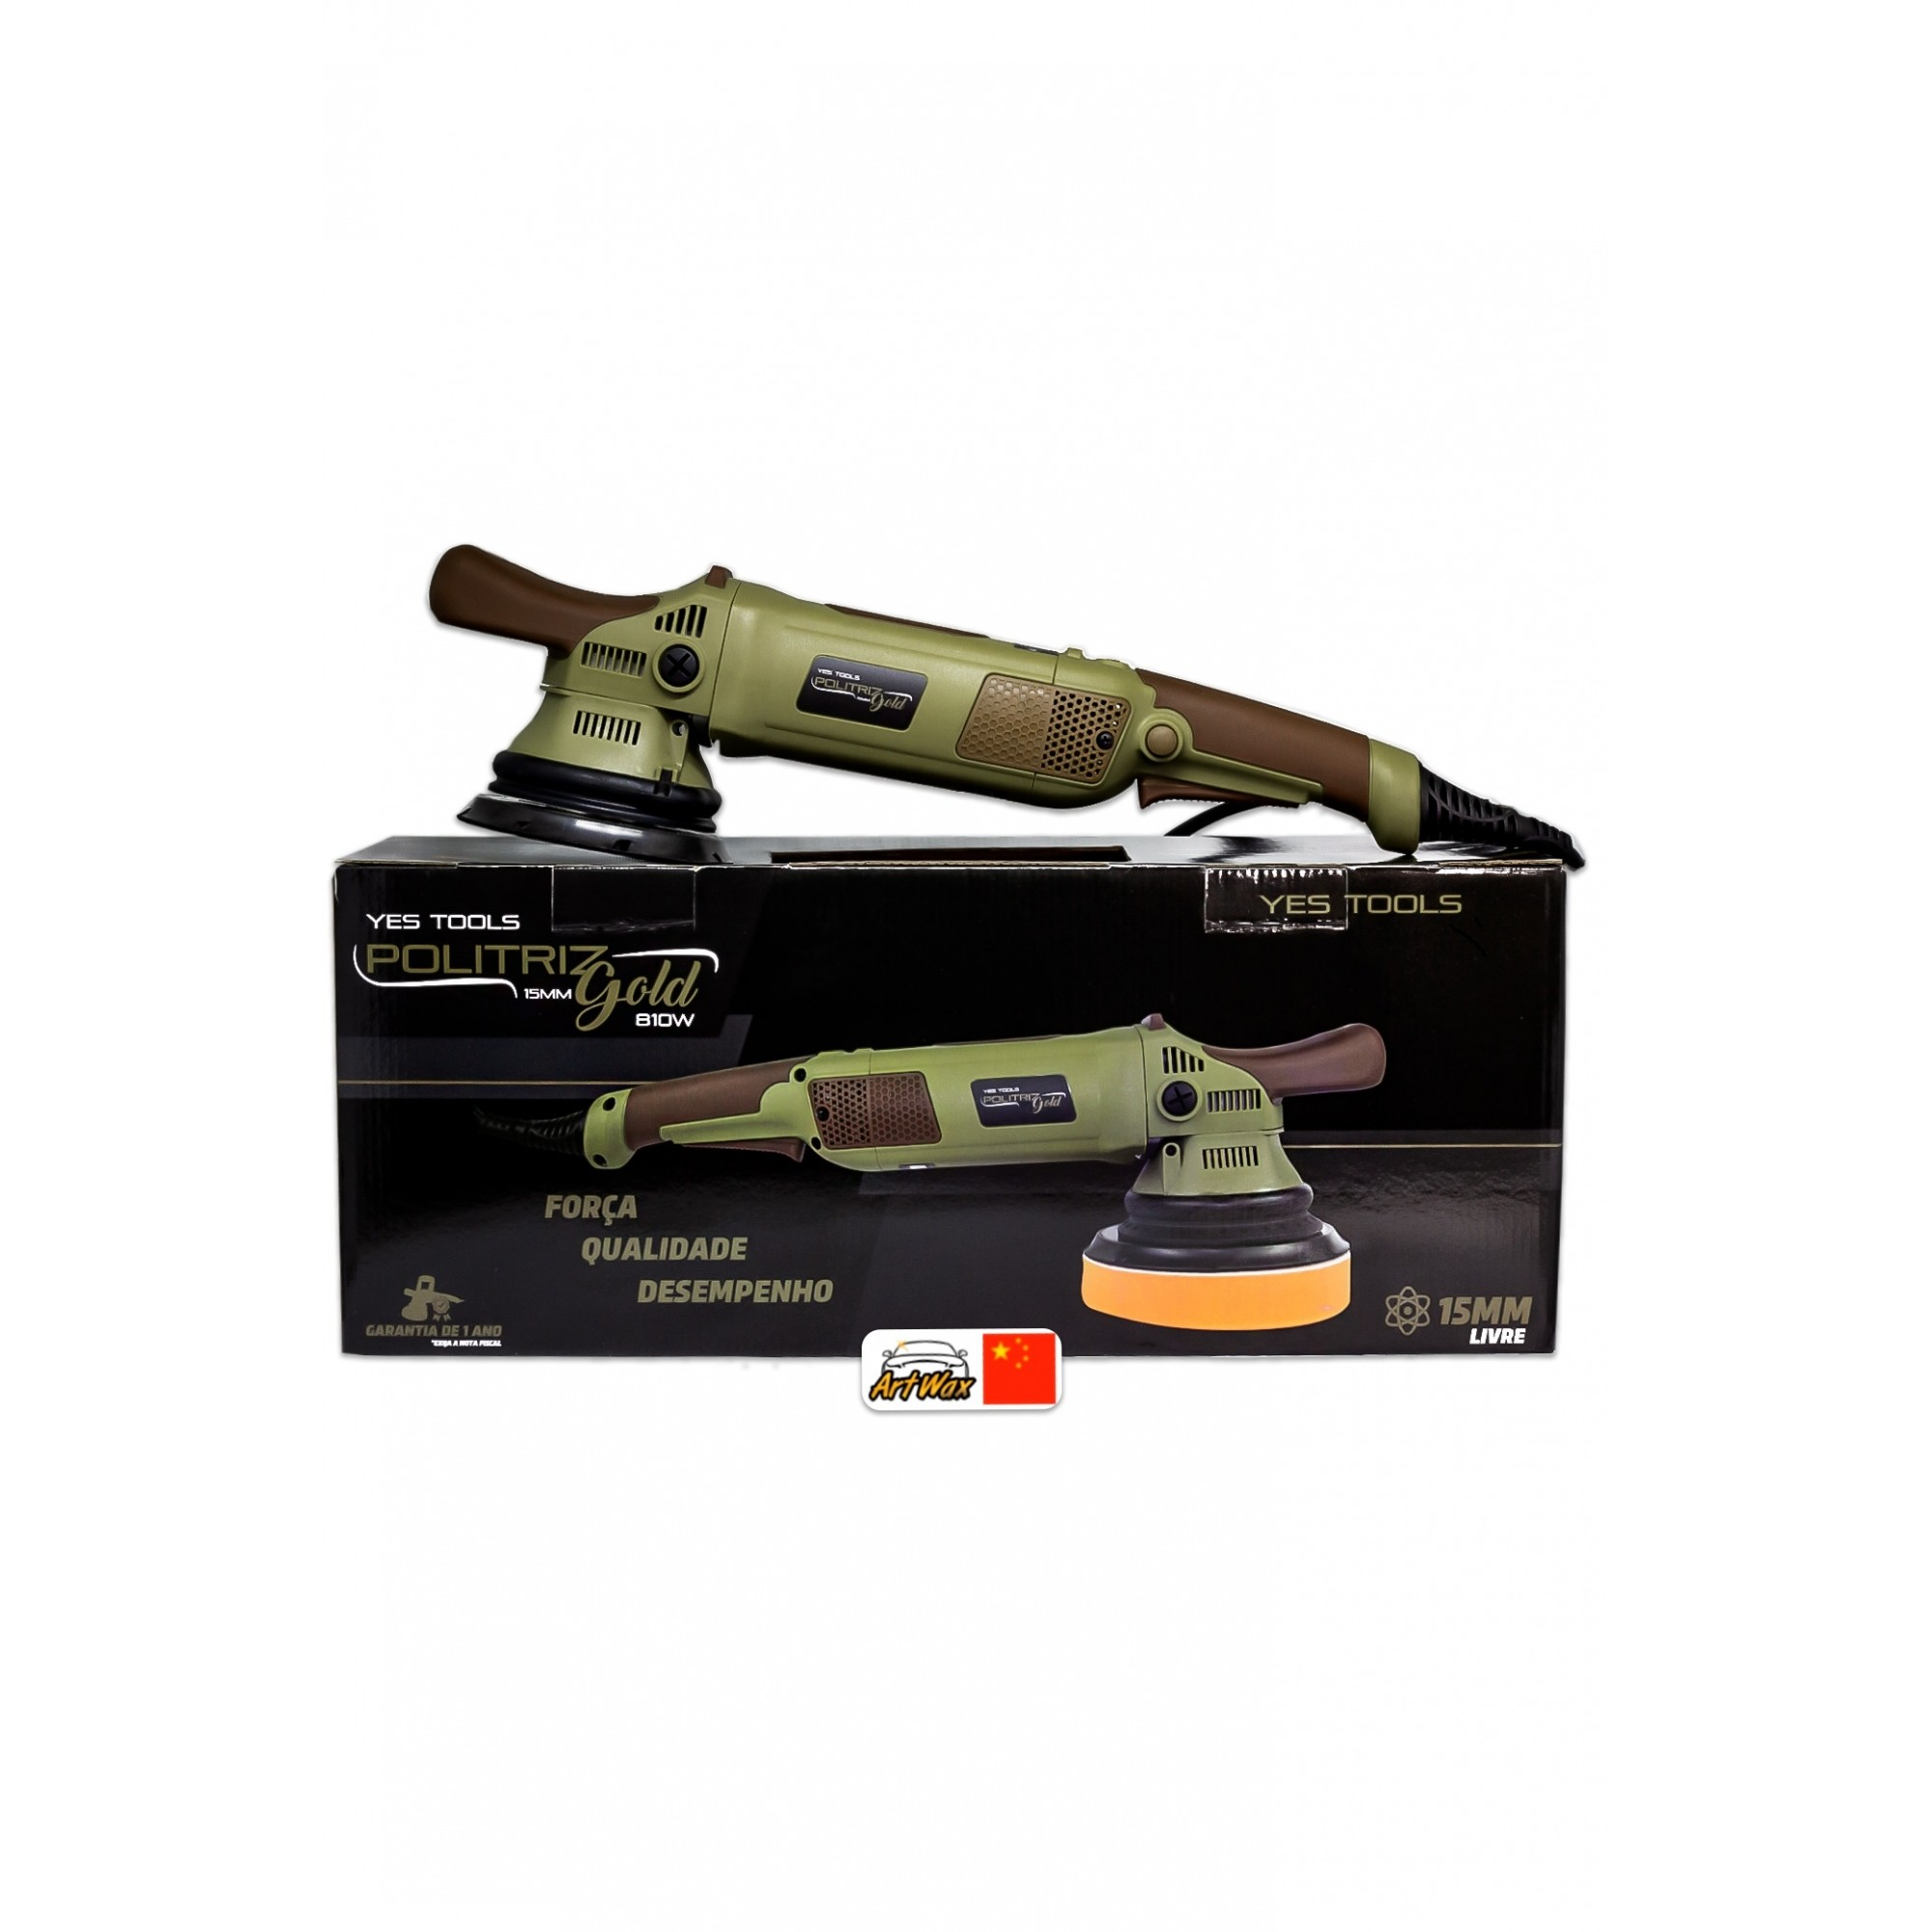 Kers Yes Tools Politriz Roto Orbital livre Gold 15mm 60Hz 810W 127v